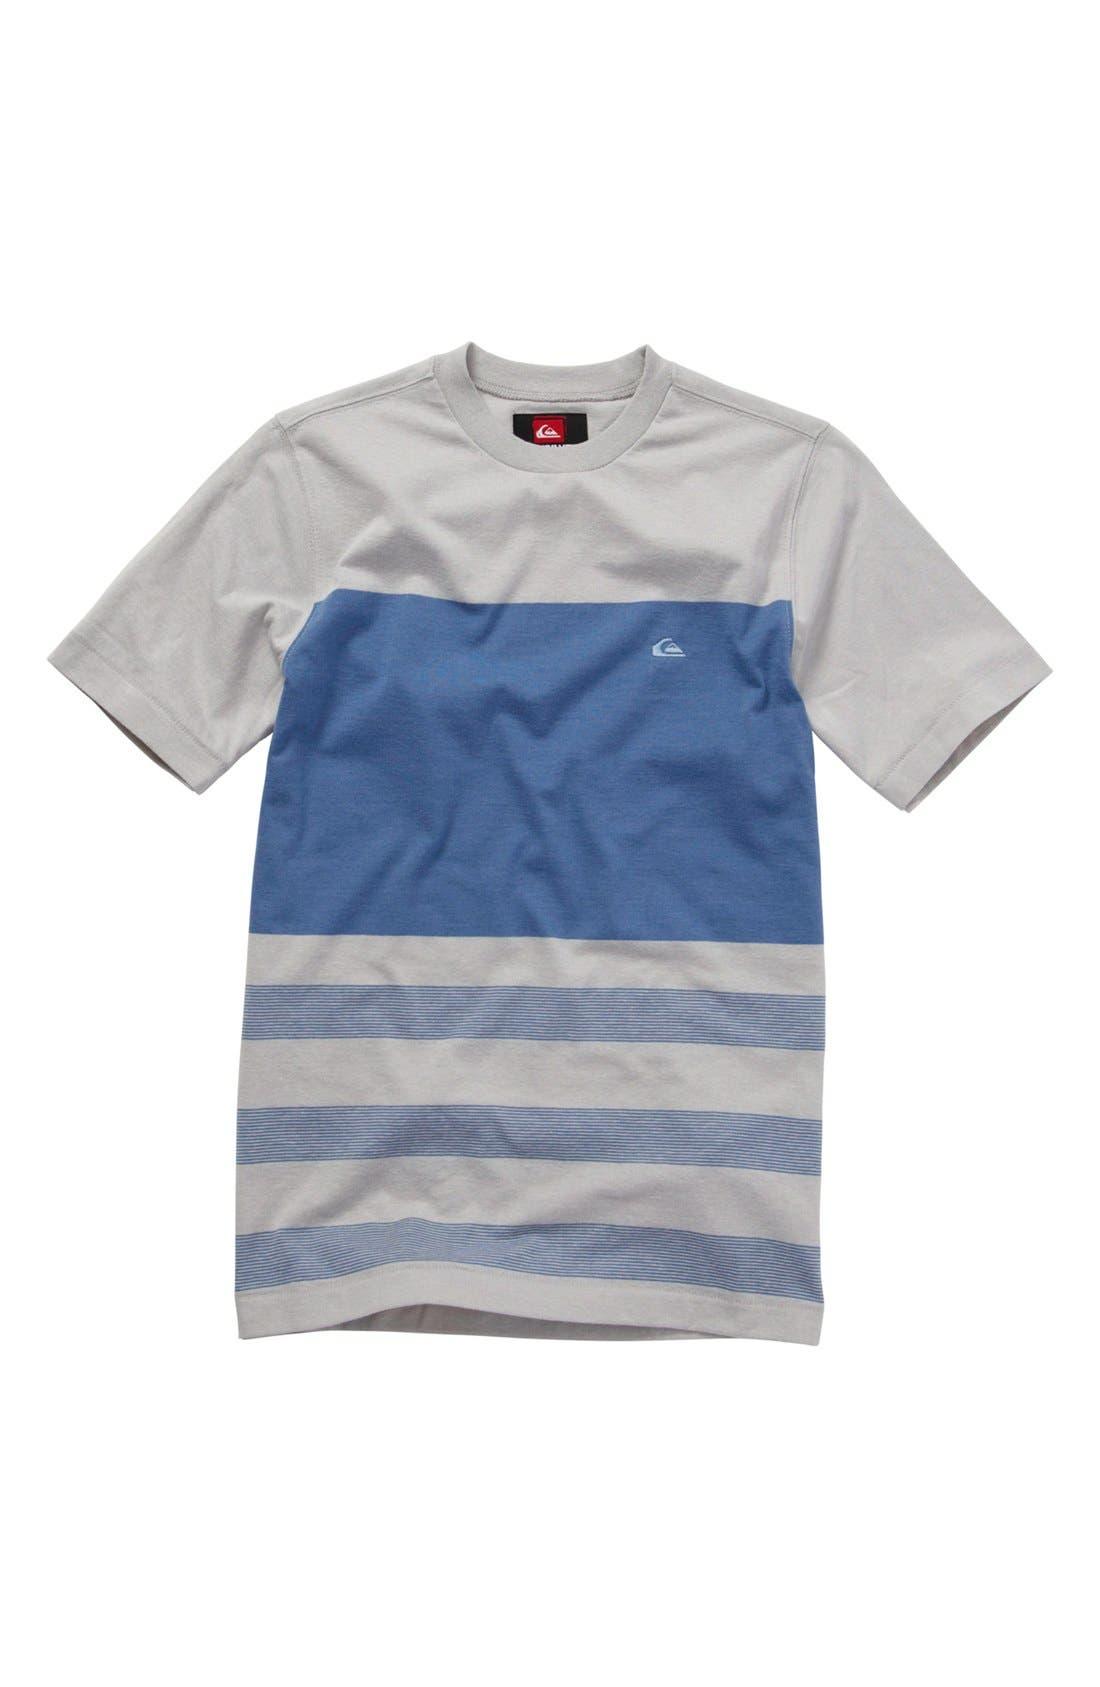 Main Image - Quiksilver 'Migo' Short Sleeve T-Shirt (Little Boys & Big Boys)